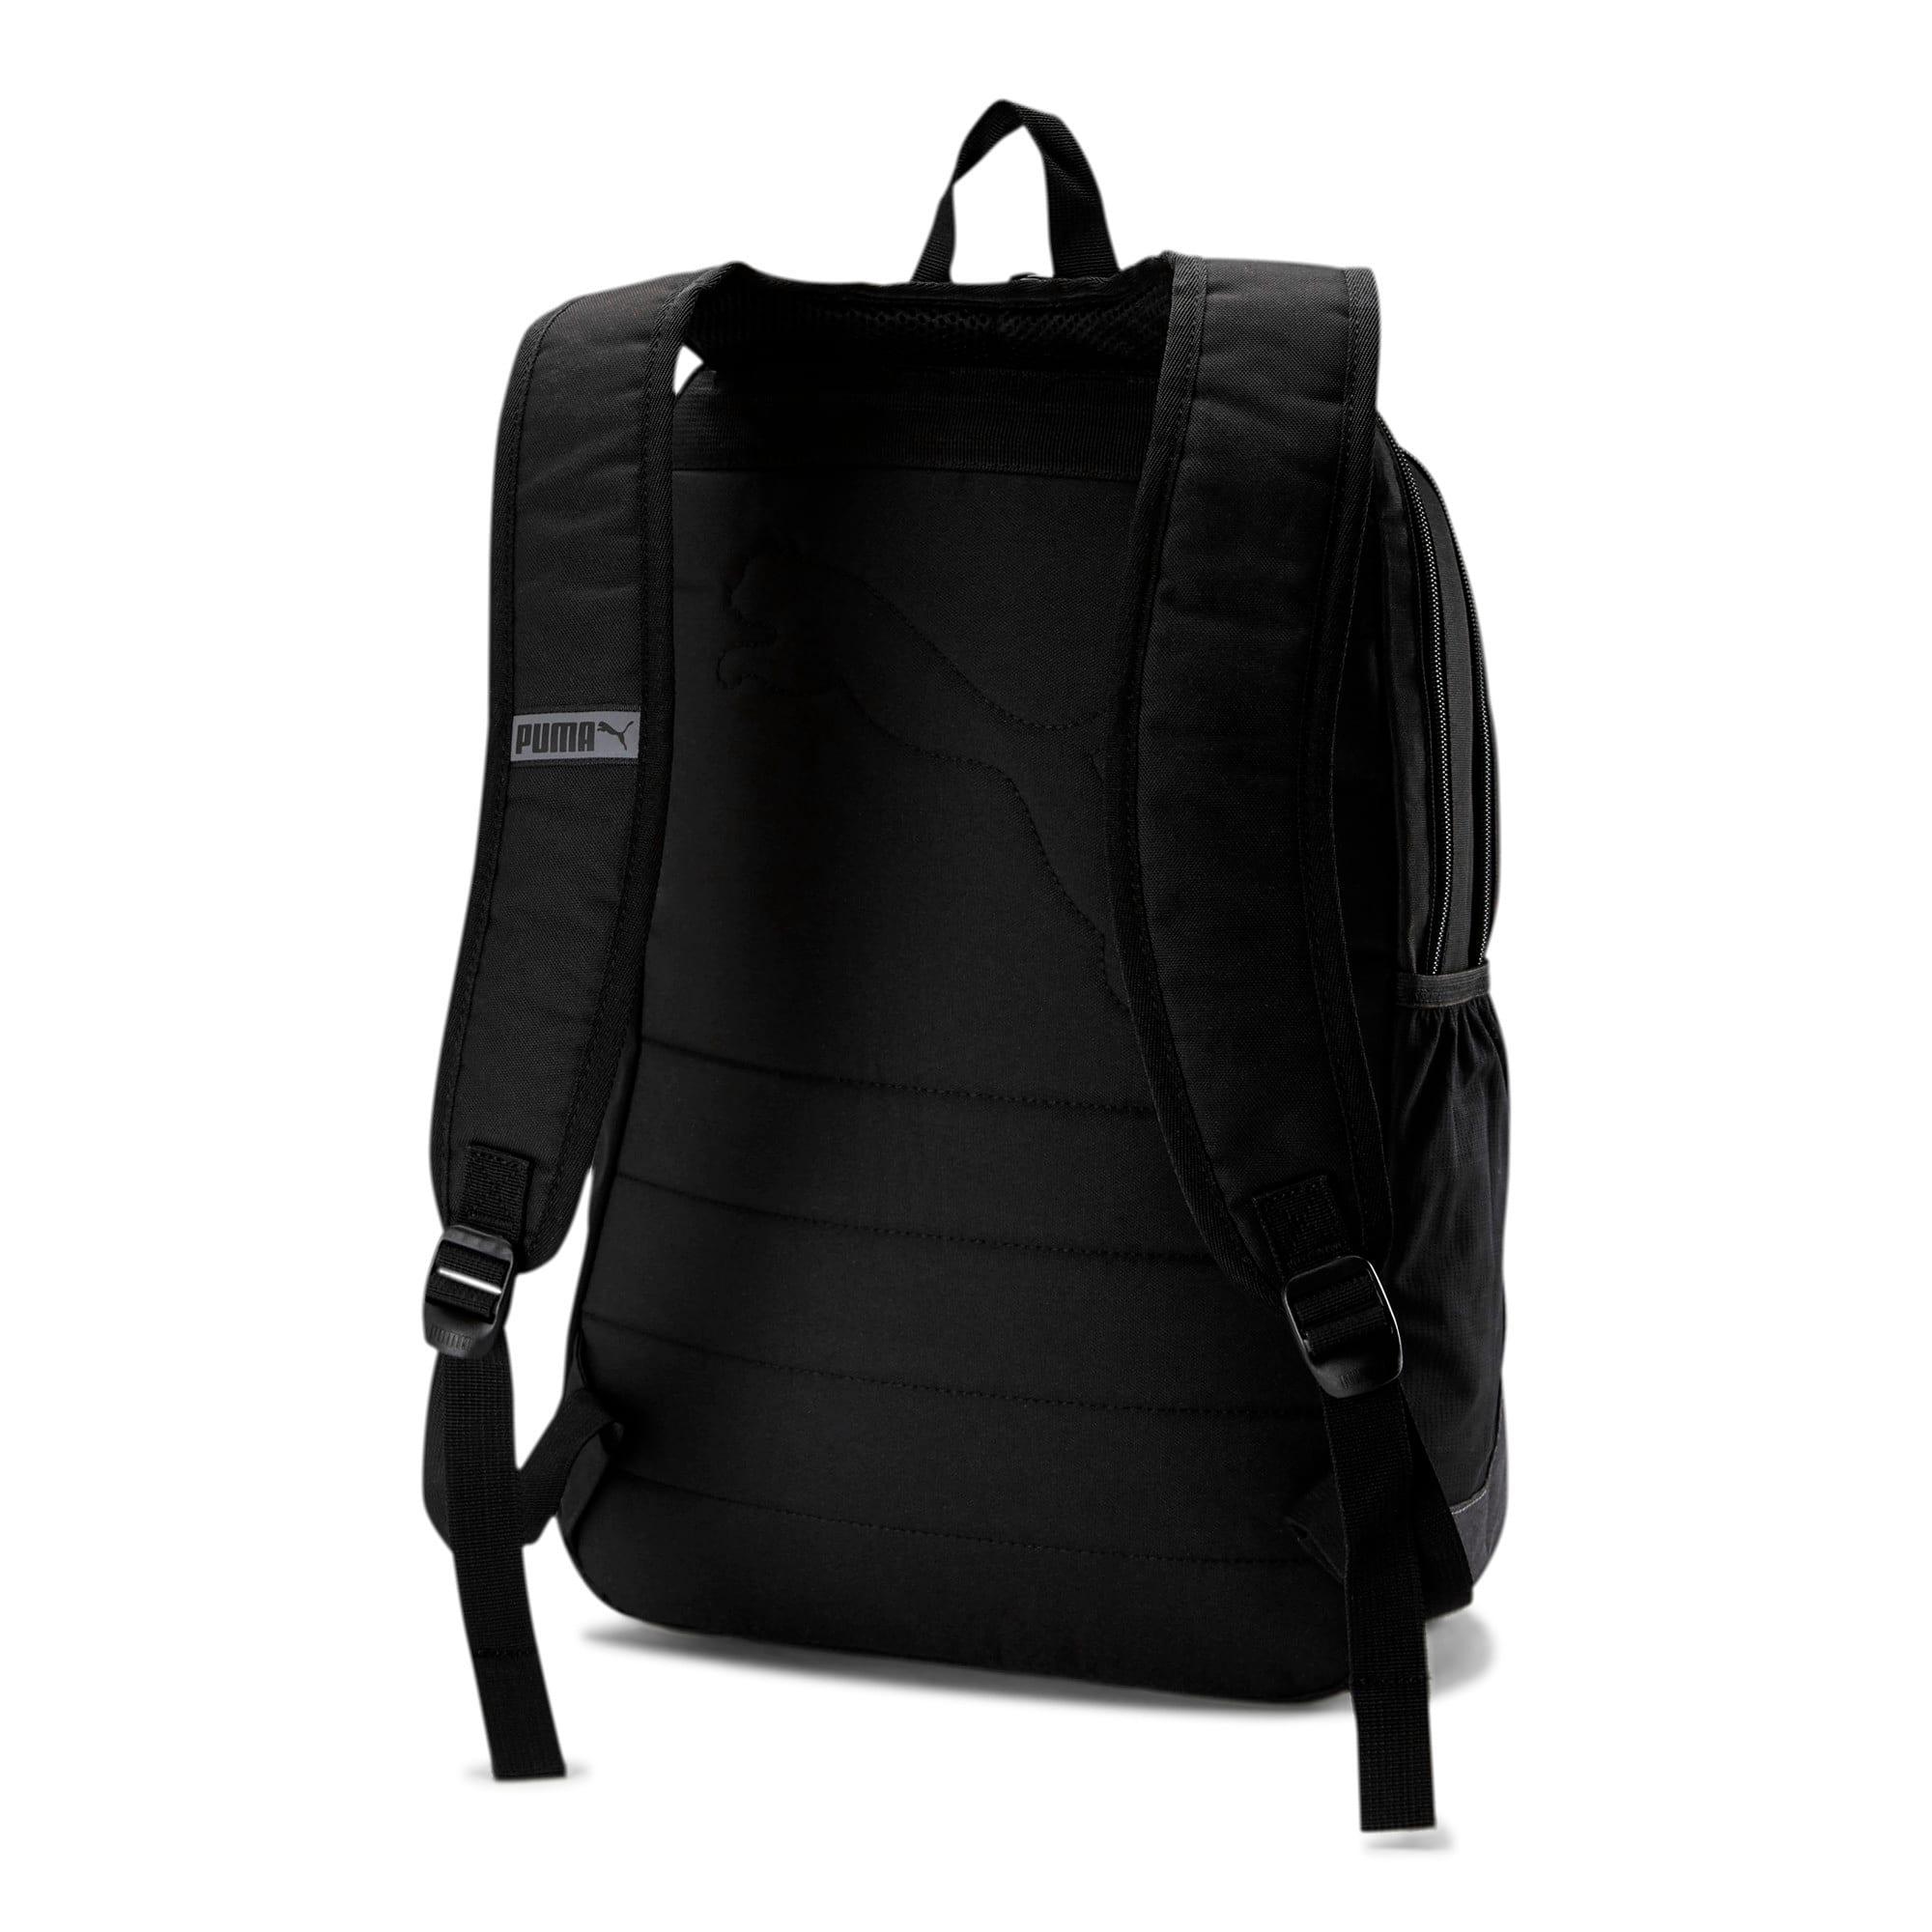 Thumbnail 2 of PUMA Everready Backpack, Dark Grey, medium